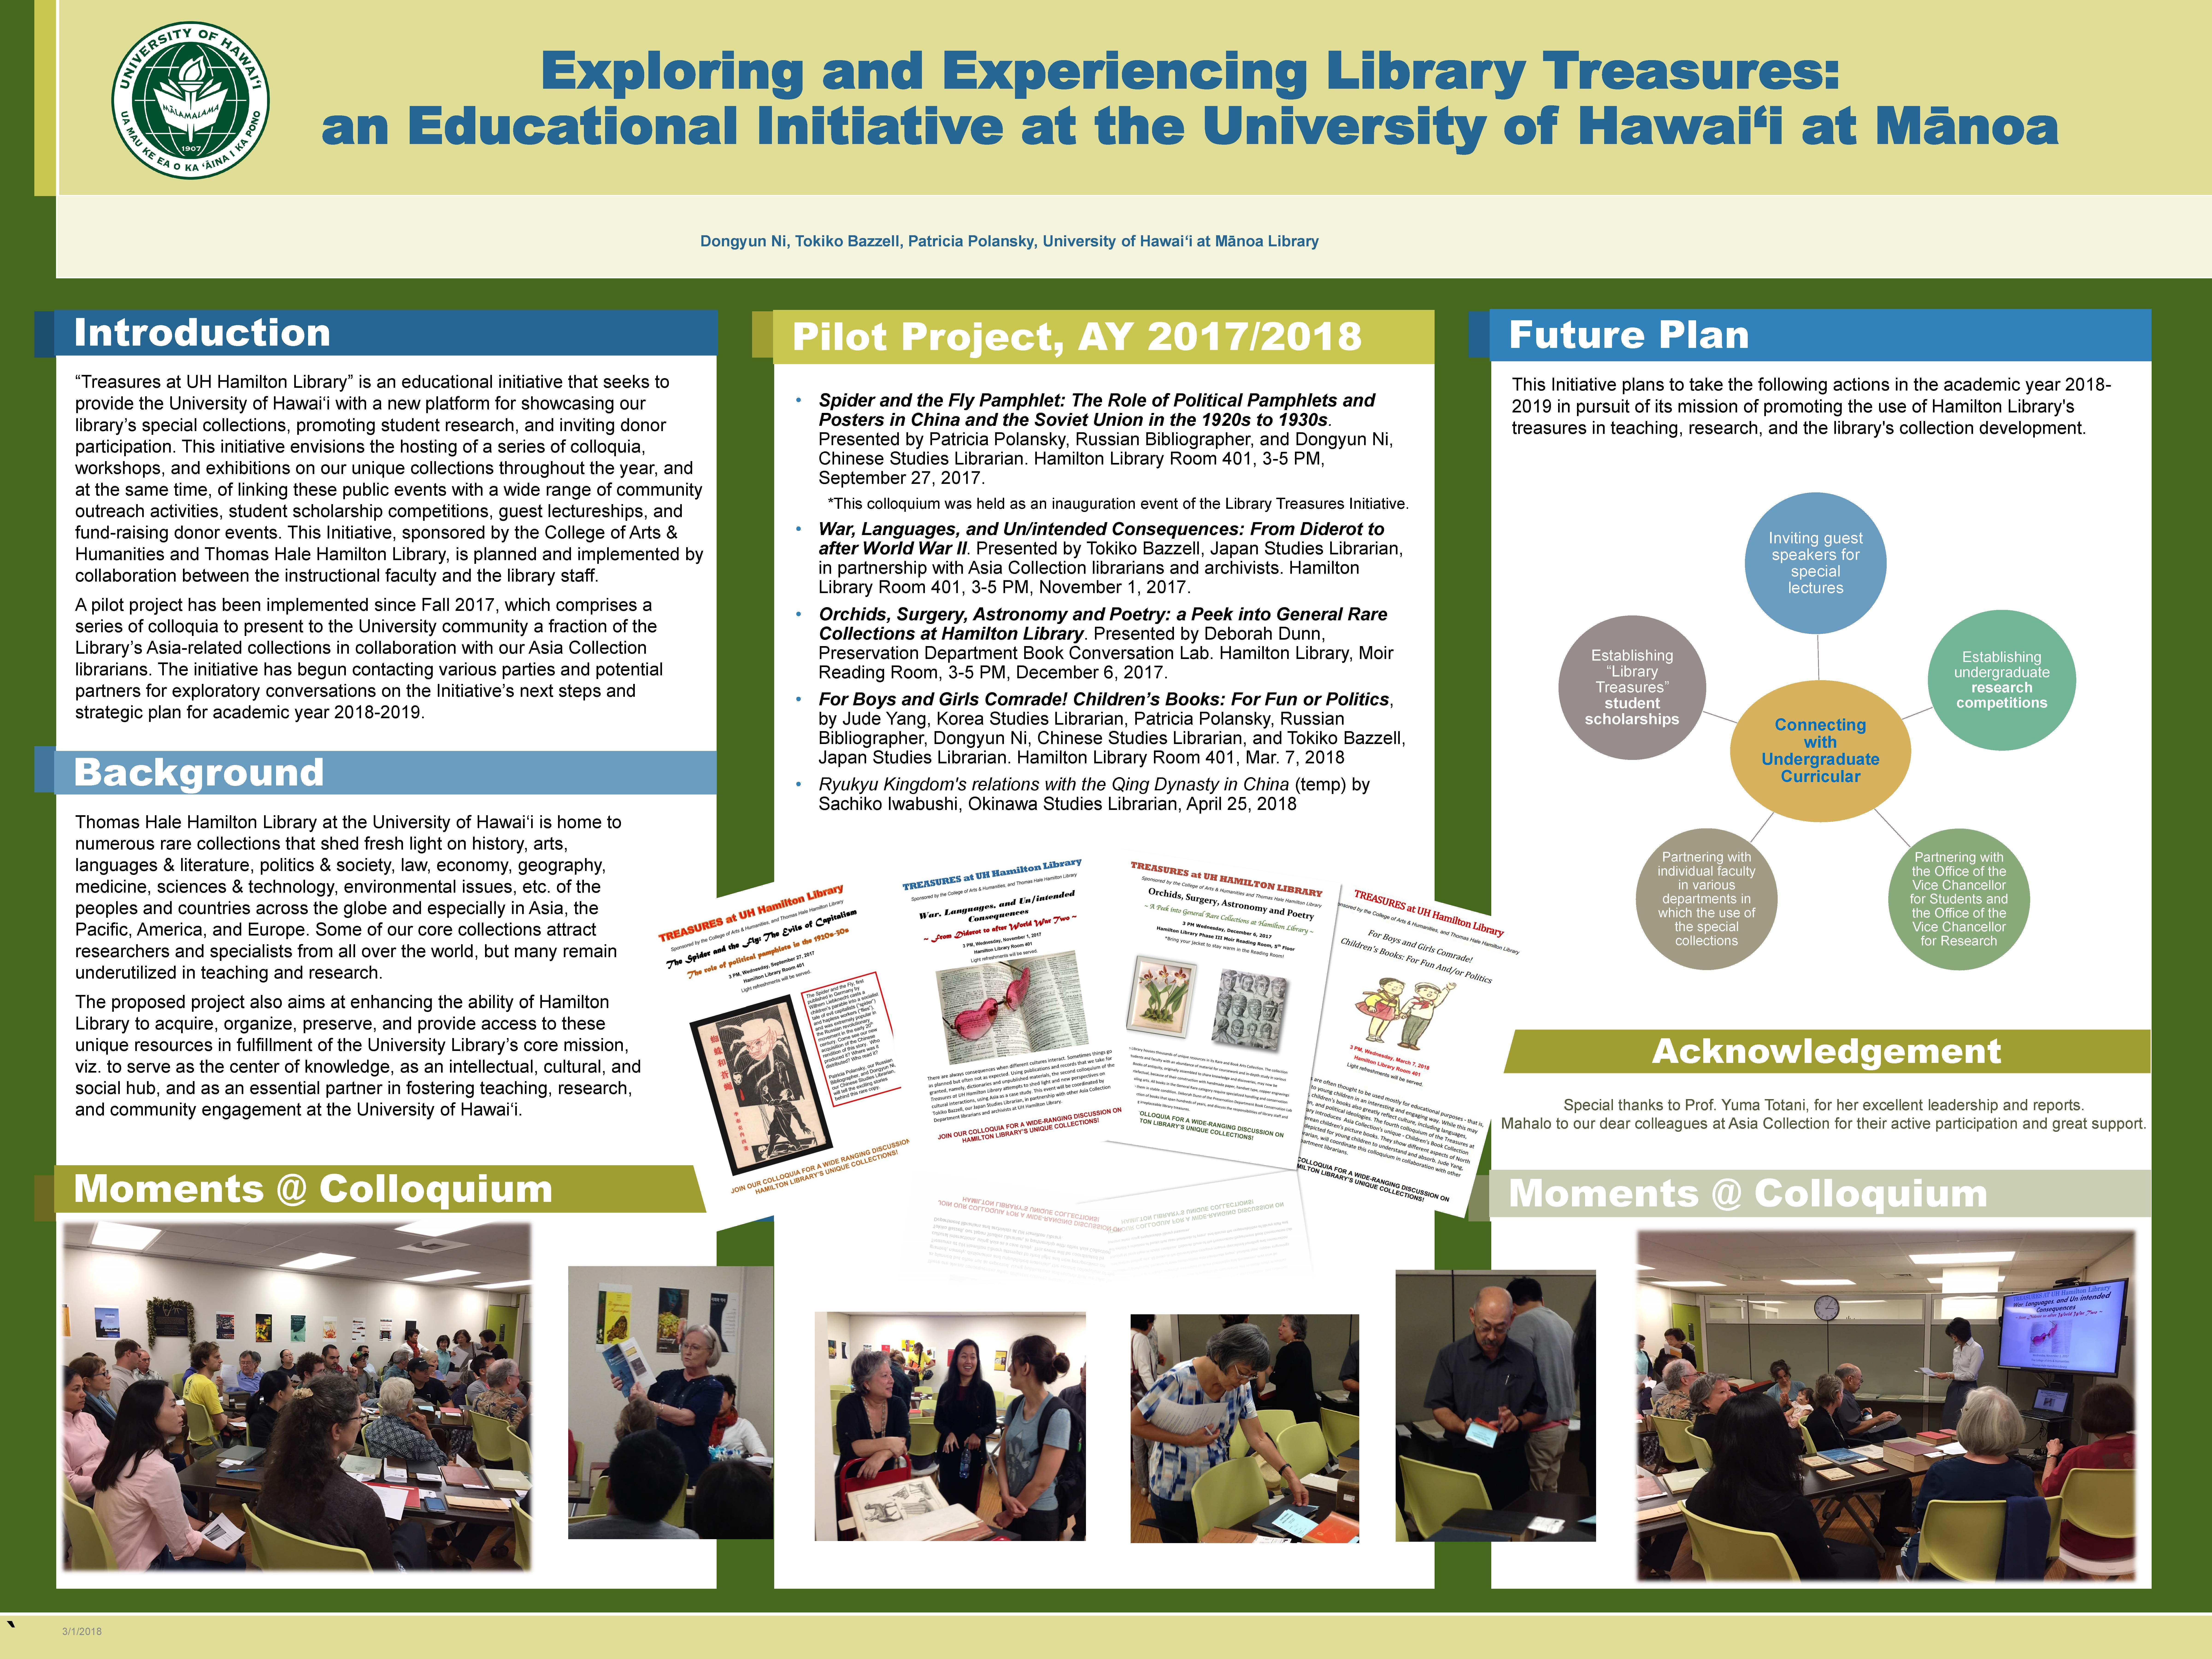 Exploring and Experiencing Library Treasures poster by Dongyun Ni, Tokiko Bazzell, and Patricia Polansky, University of Hawaii at Manoa Library